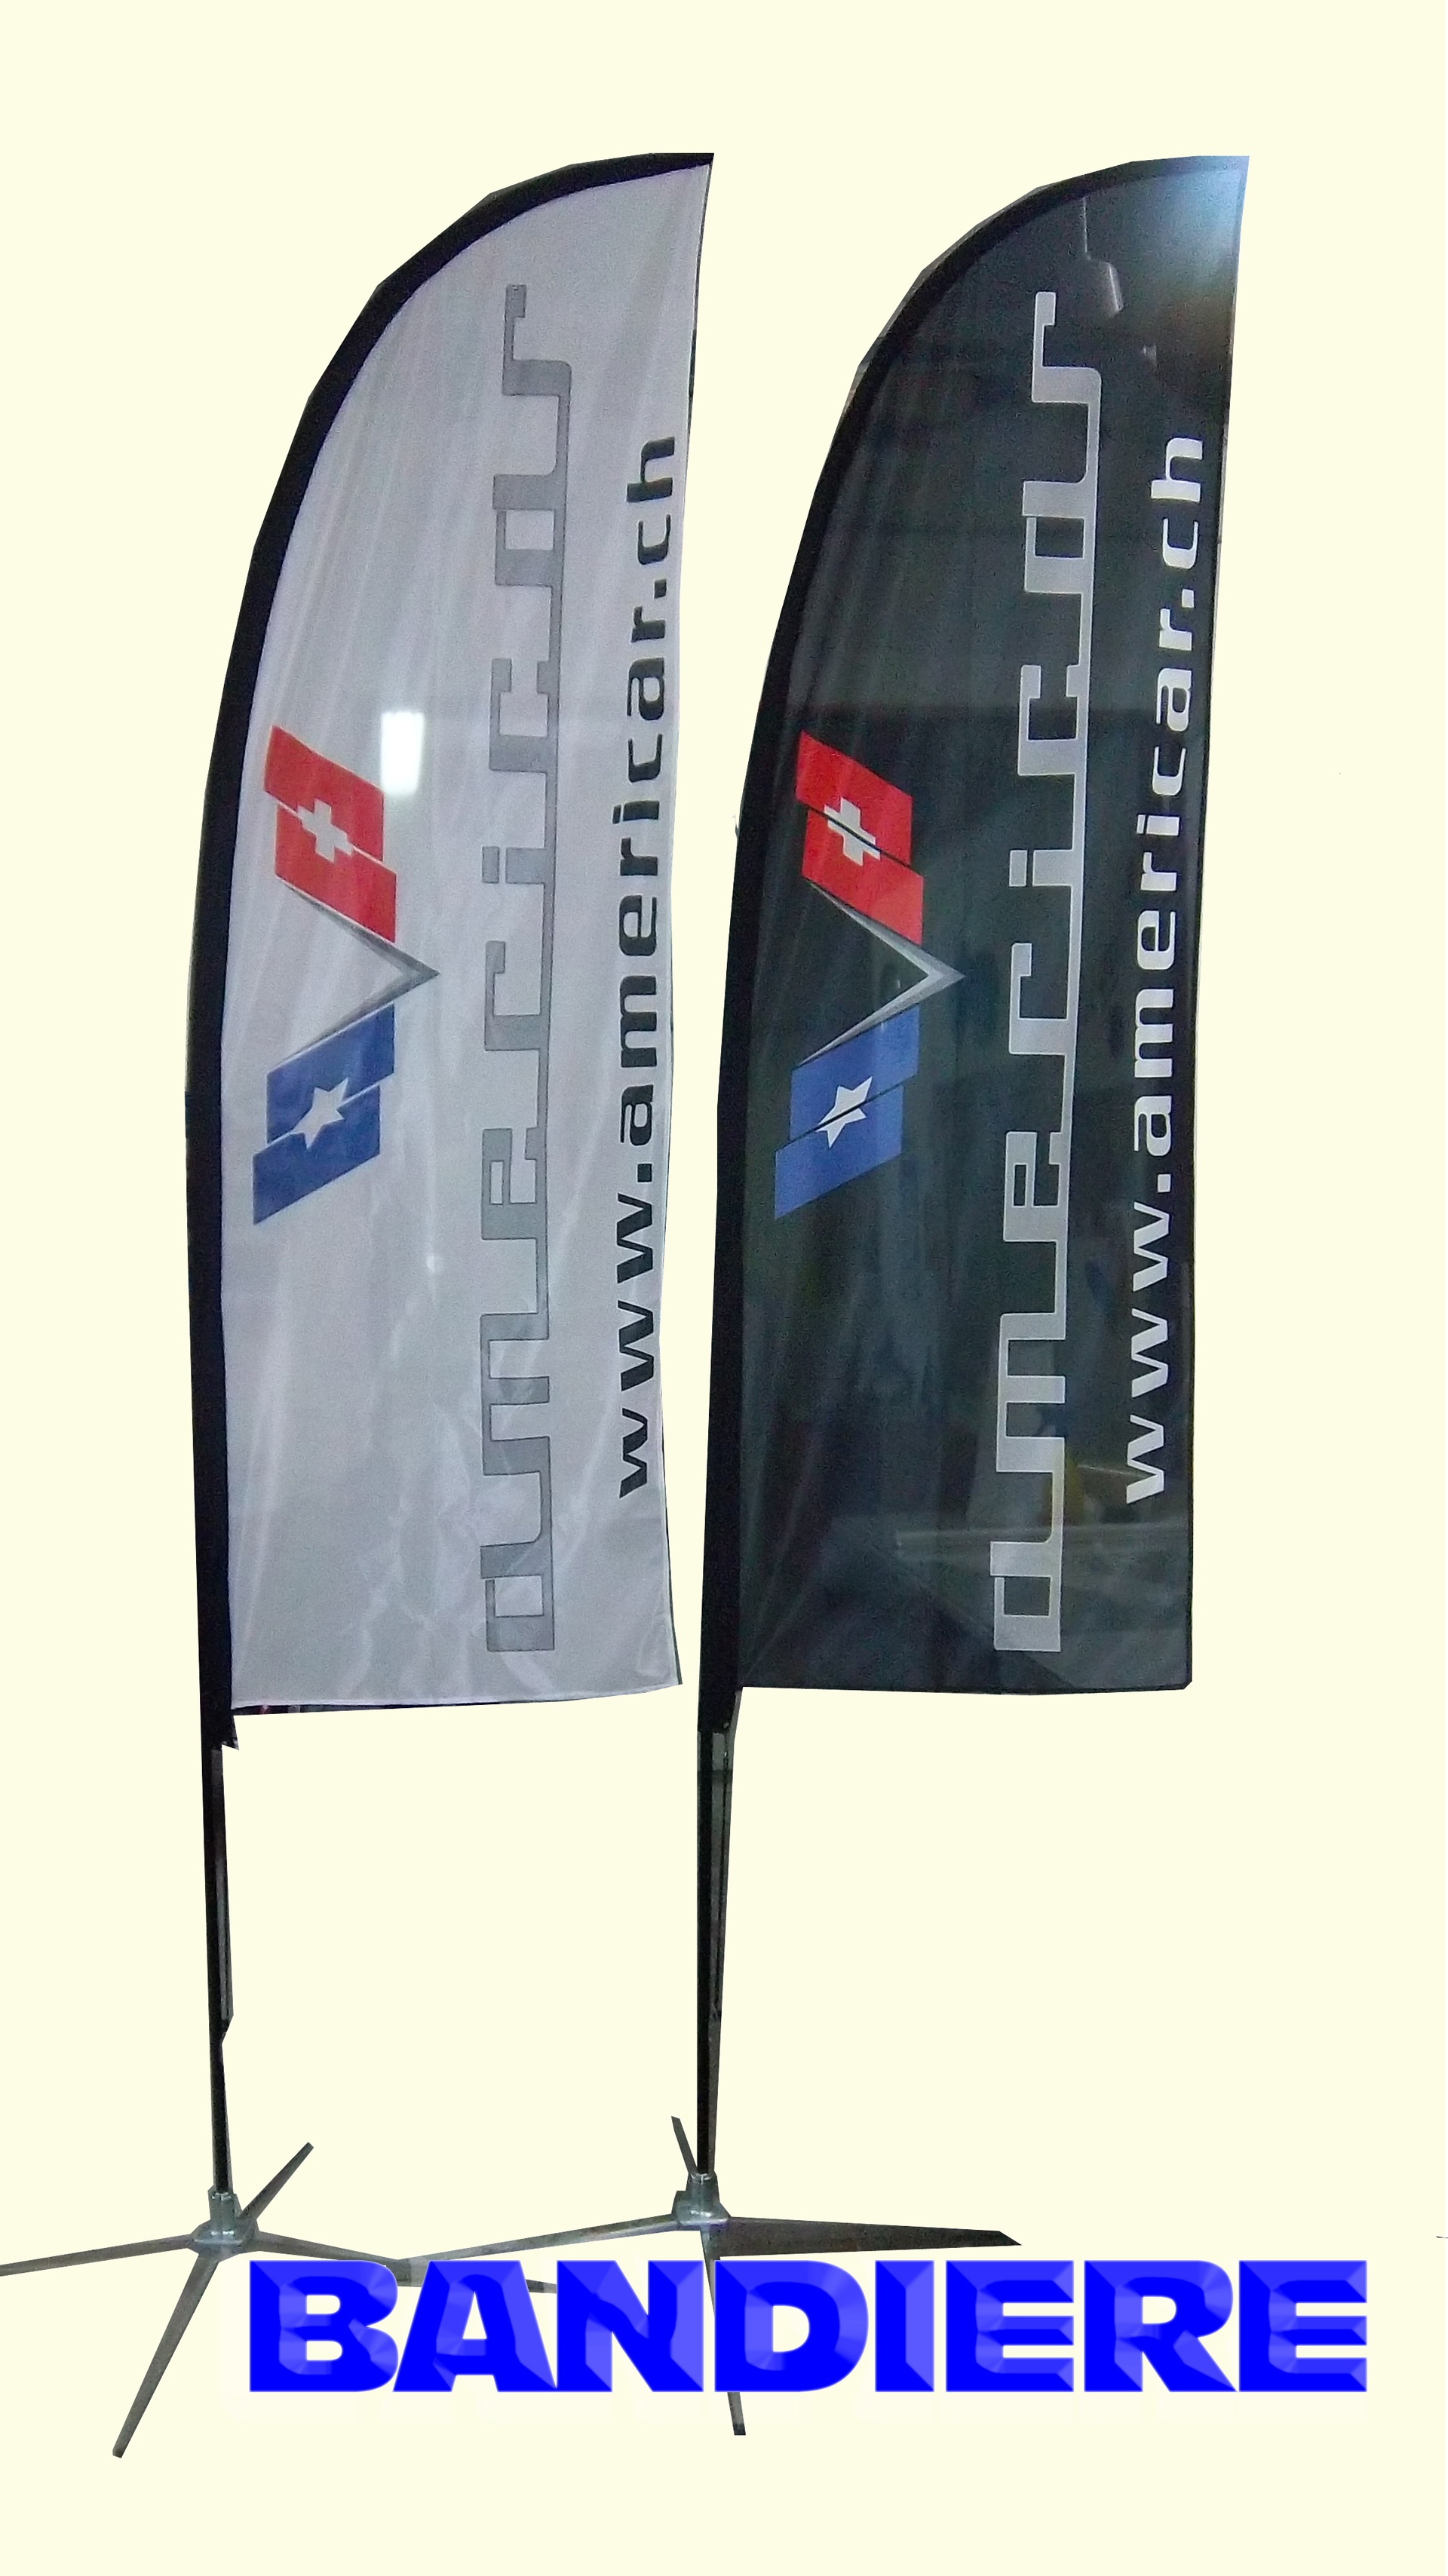 espositori bandiere sericart2